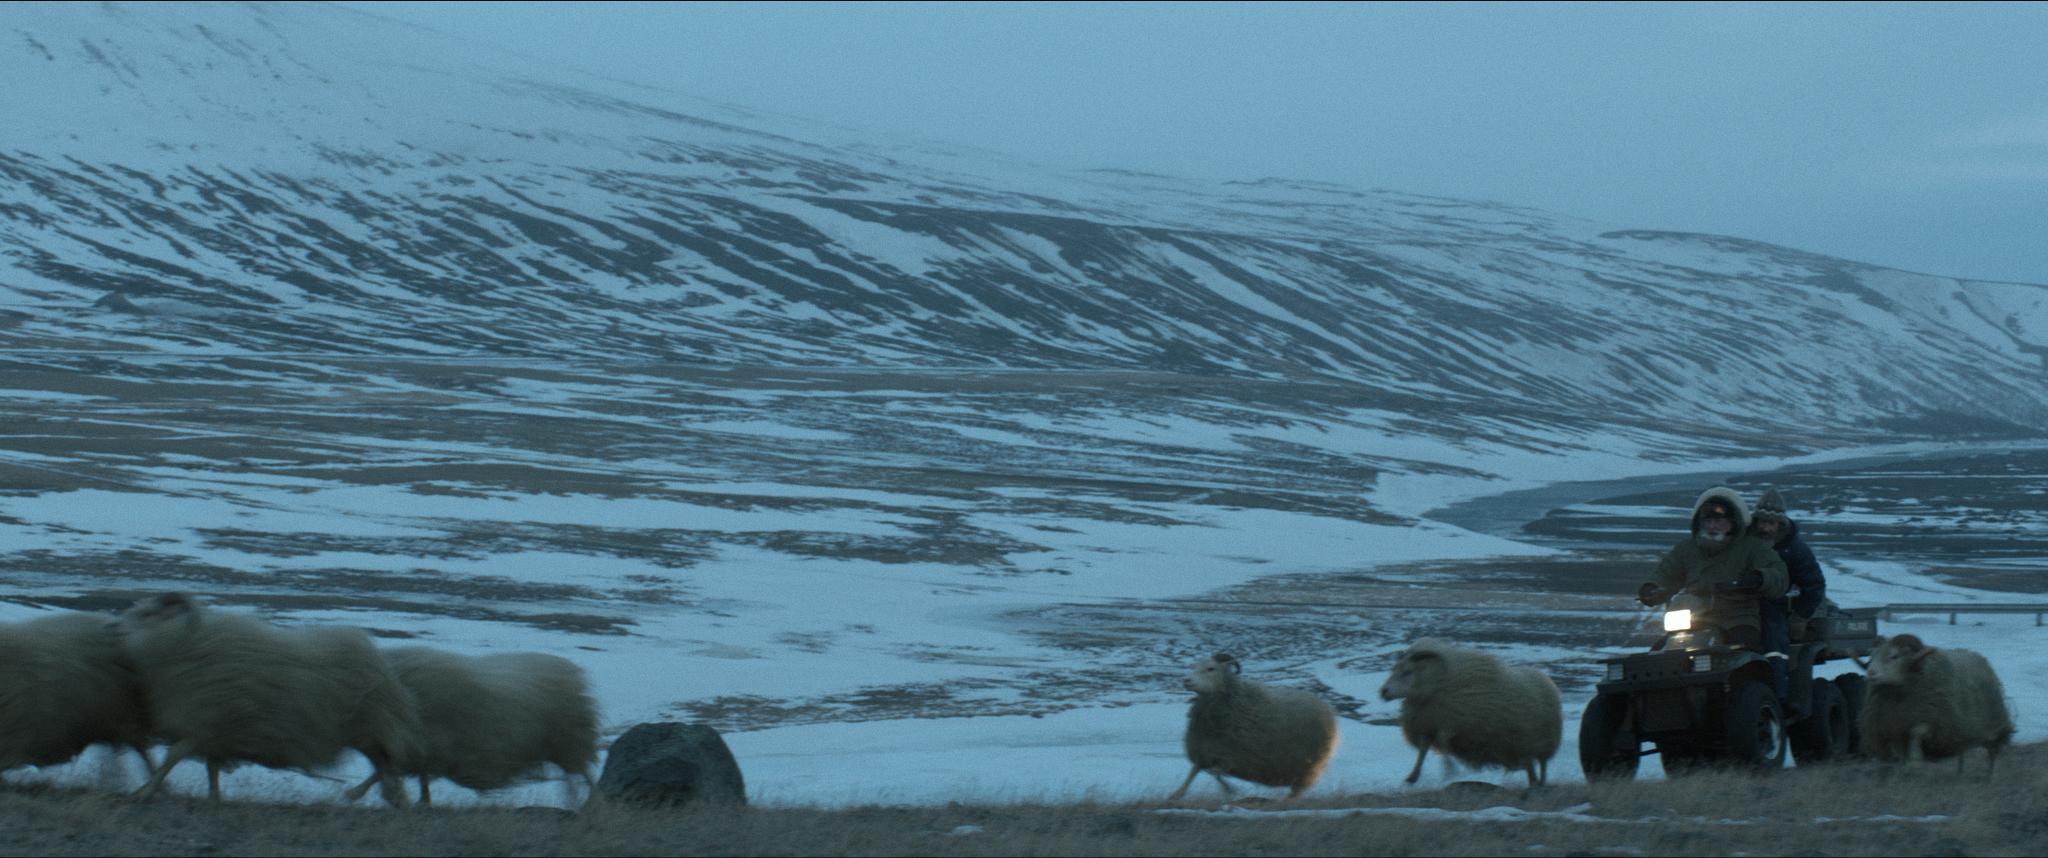 RAMS_06_TęNetop_Films_2015_PhotoTę_Sturla_Brandth_Gr+Şvlen